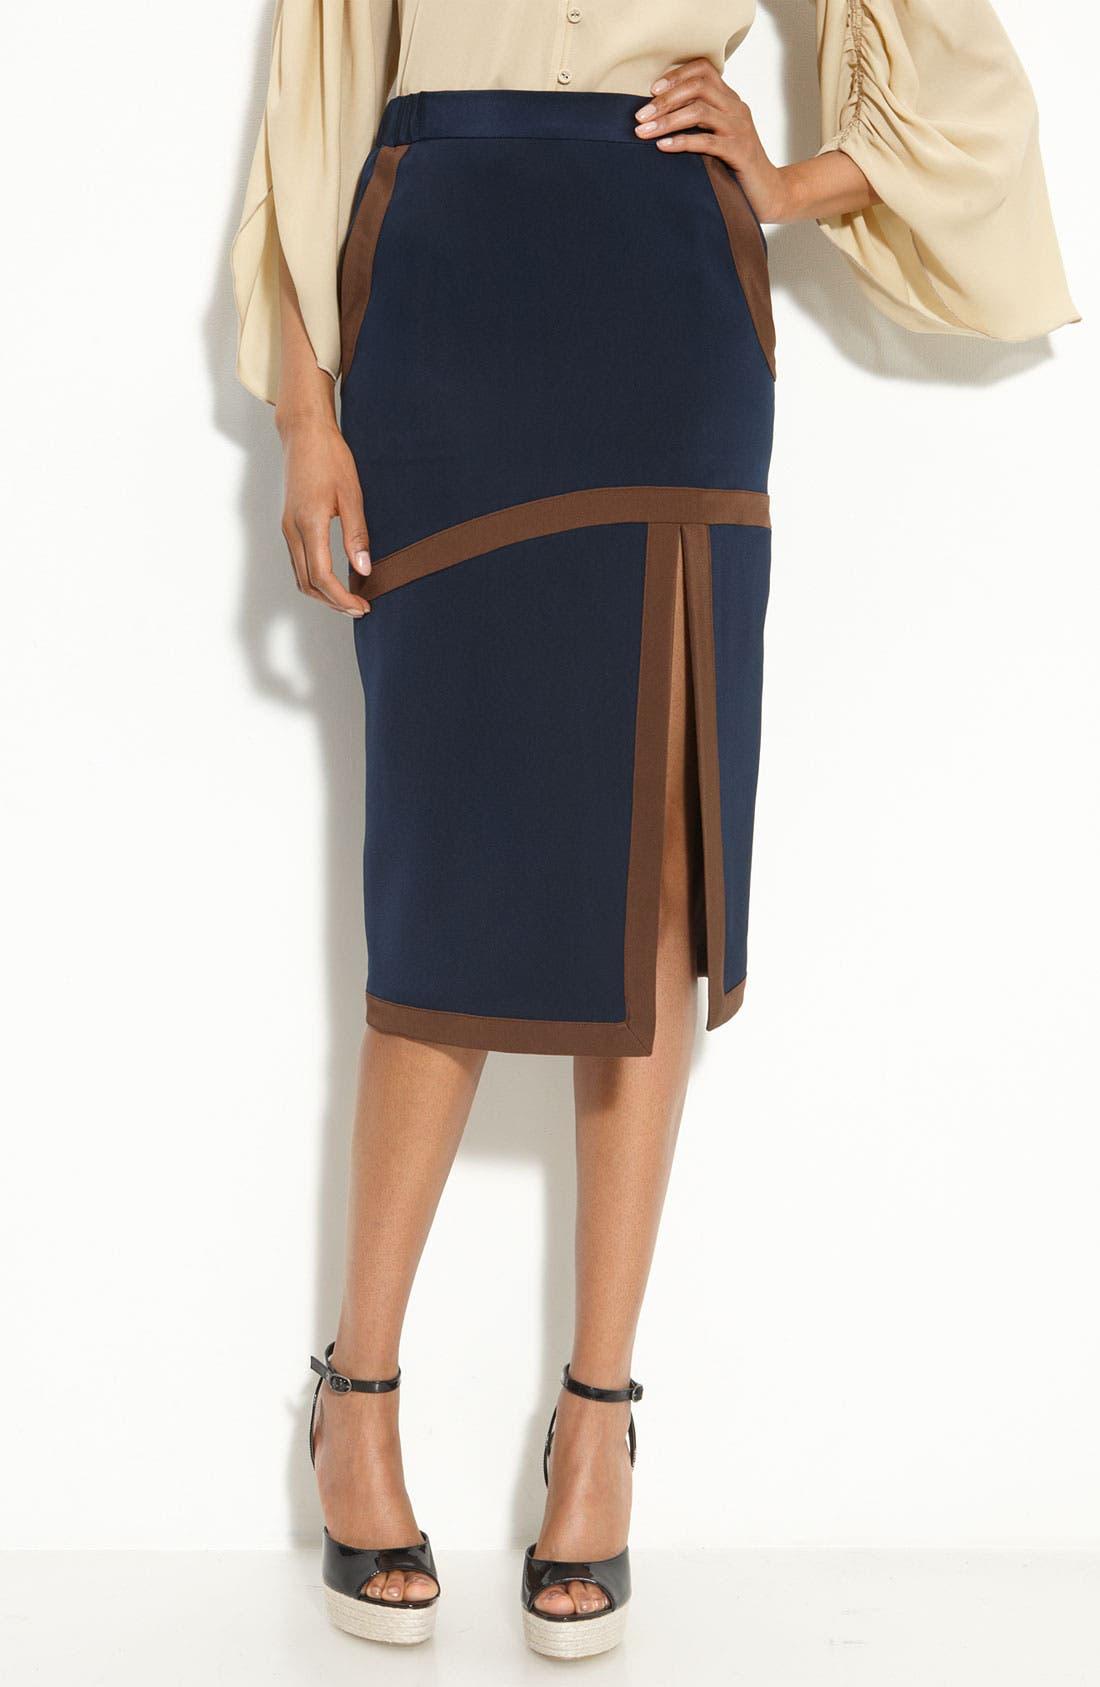 Alternate Image 1 Selected - RADENRORO 'Darmi' Silk Skirt